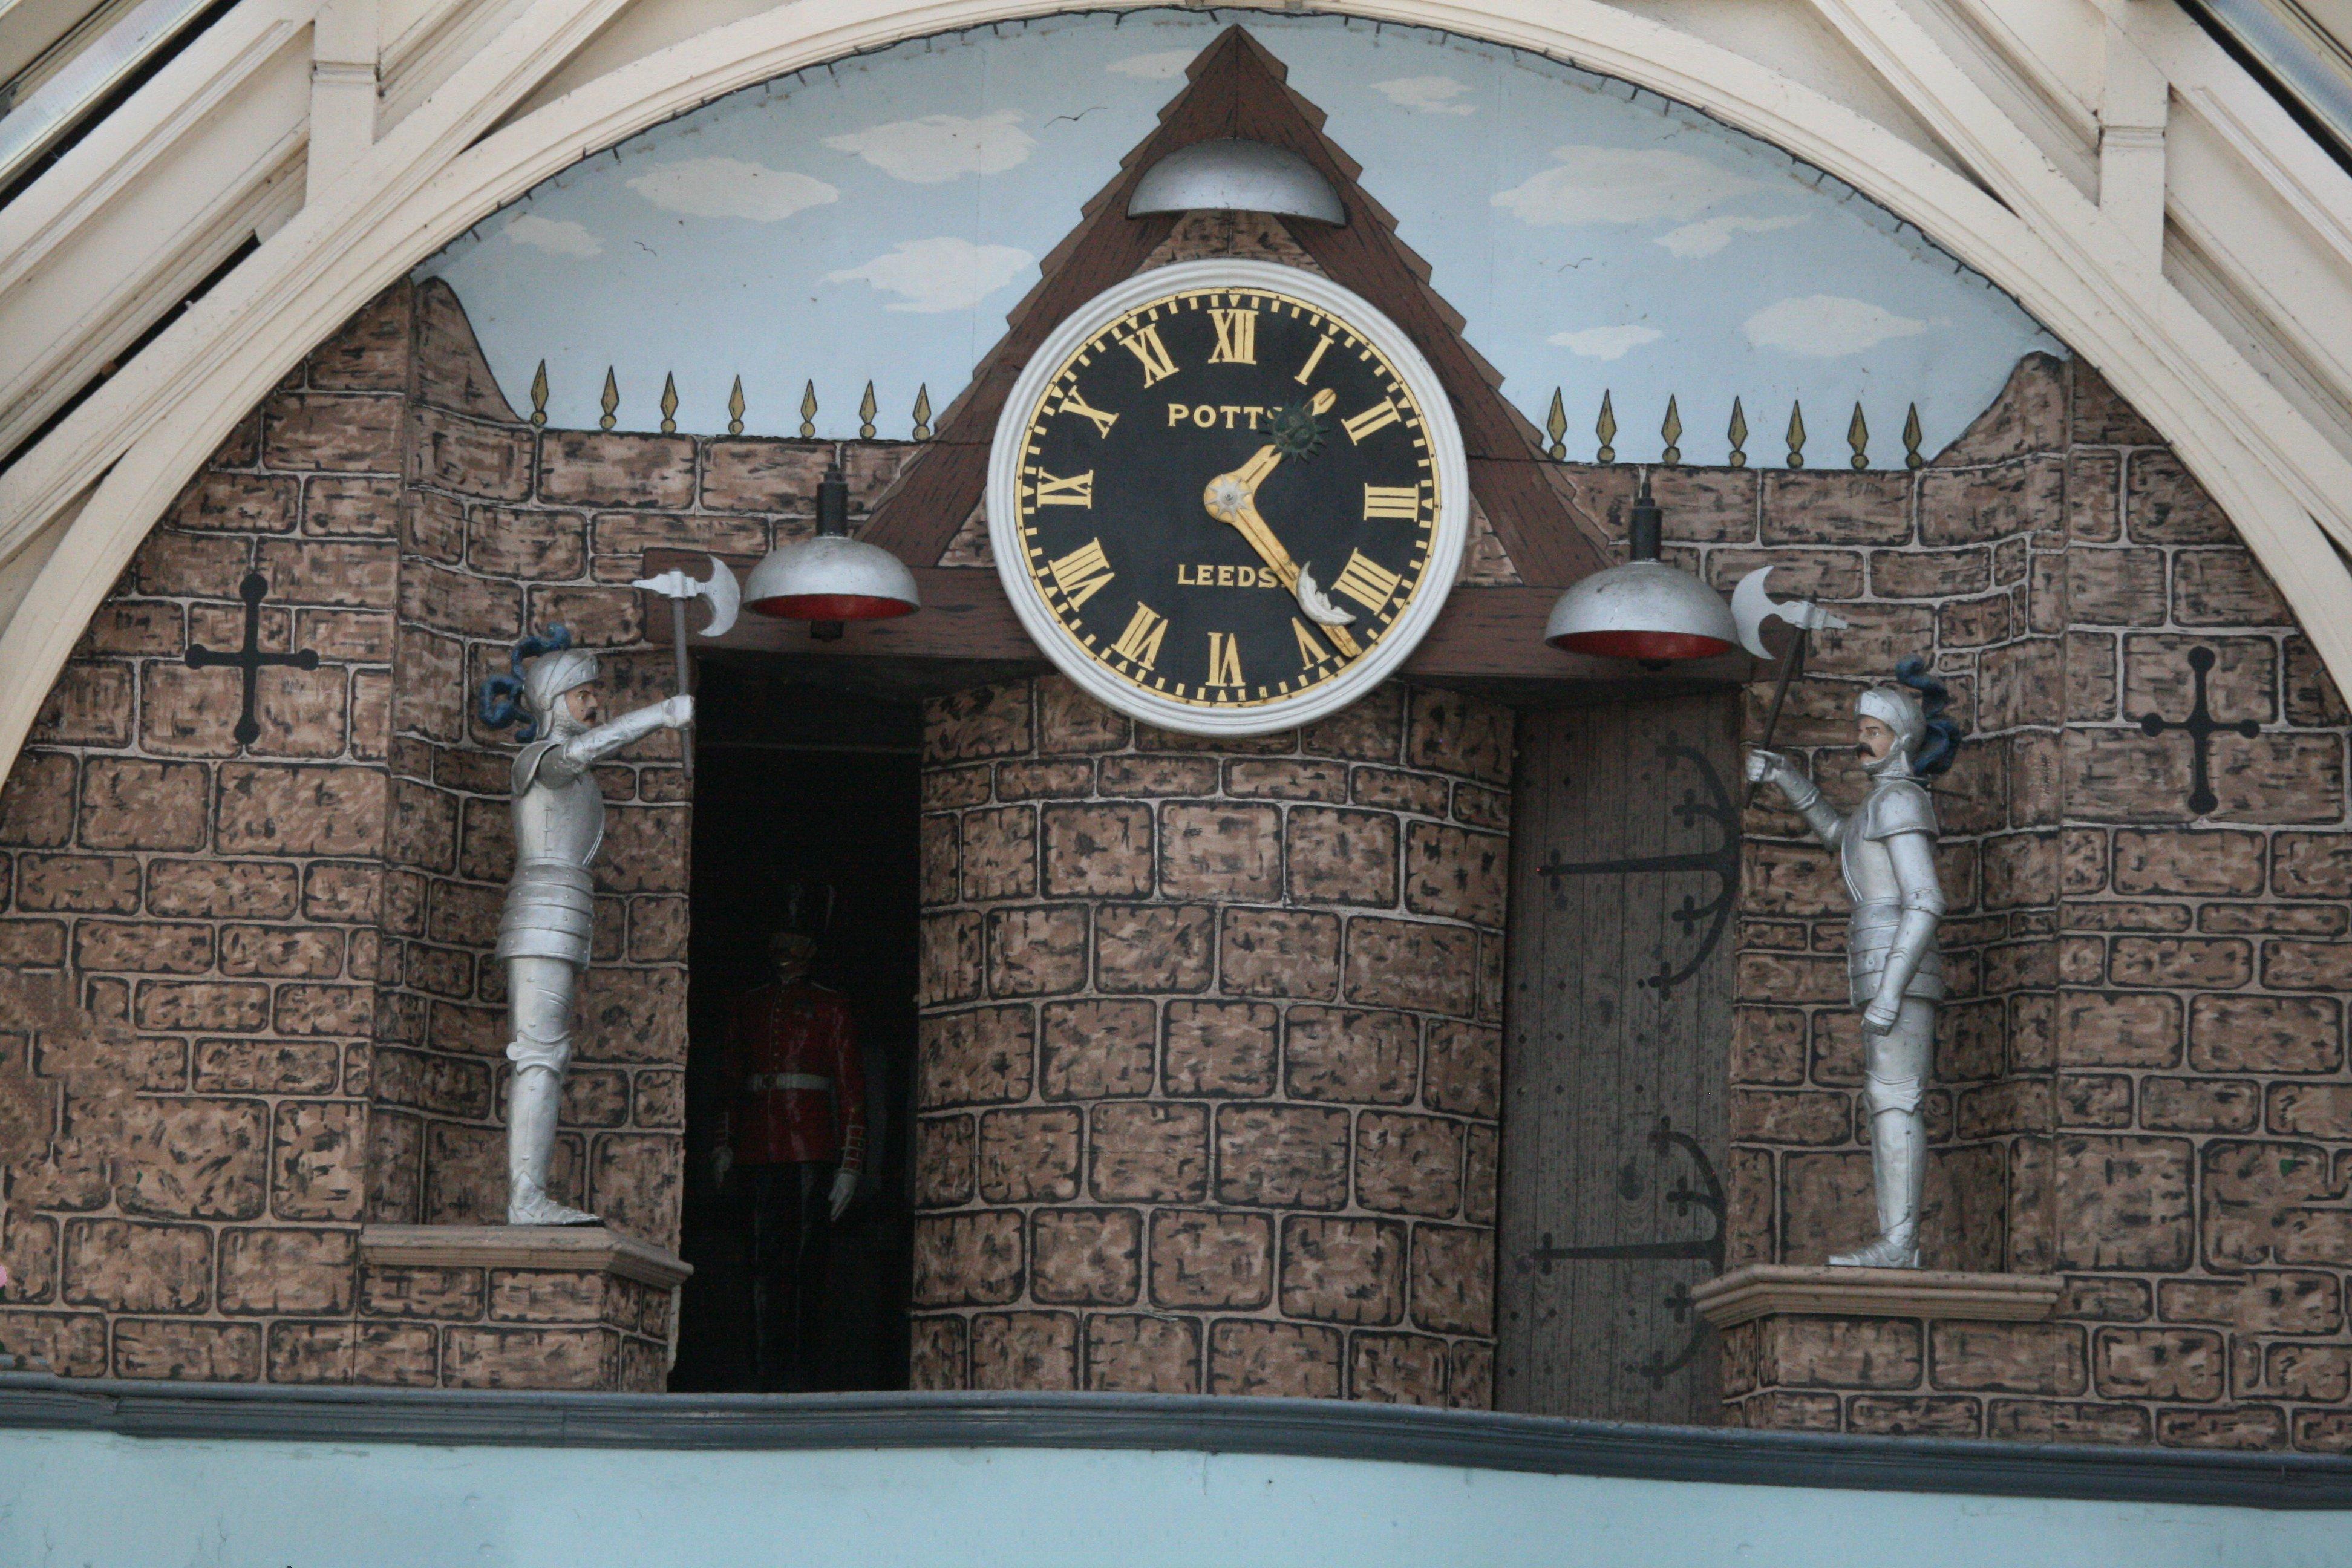 The clock in arcade